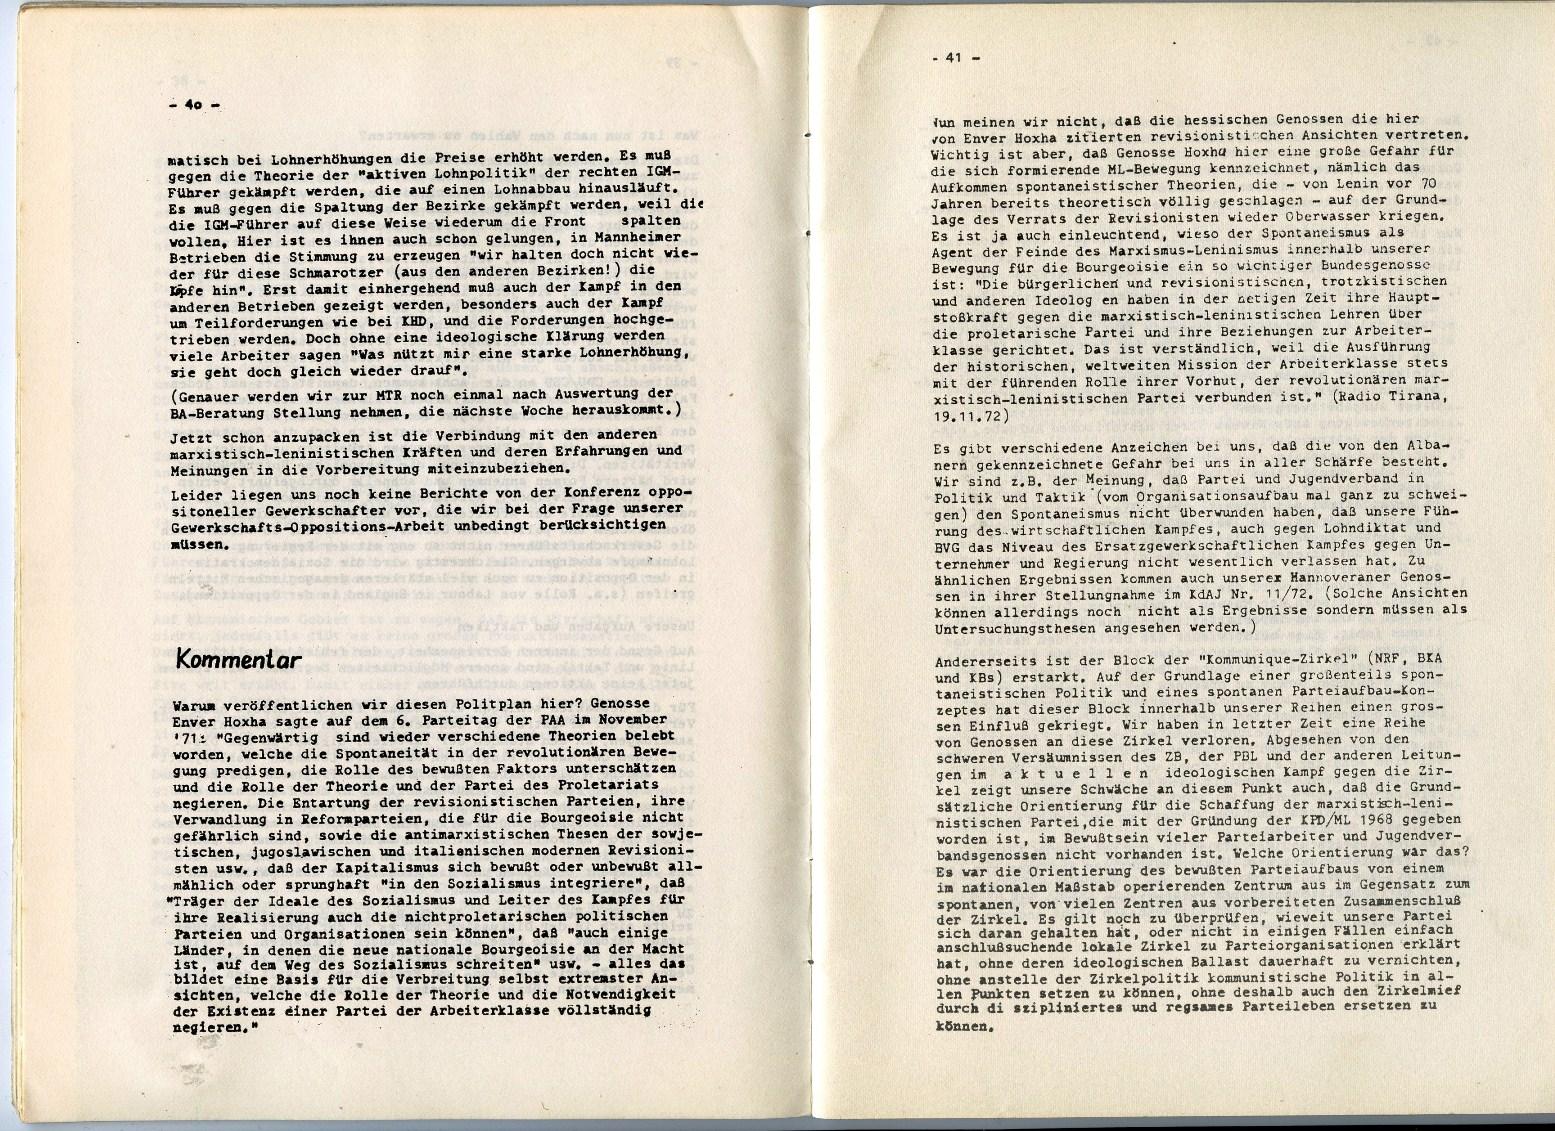 ZB_Universitas_1972_24